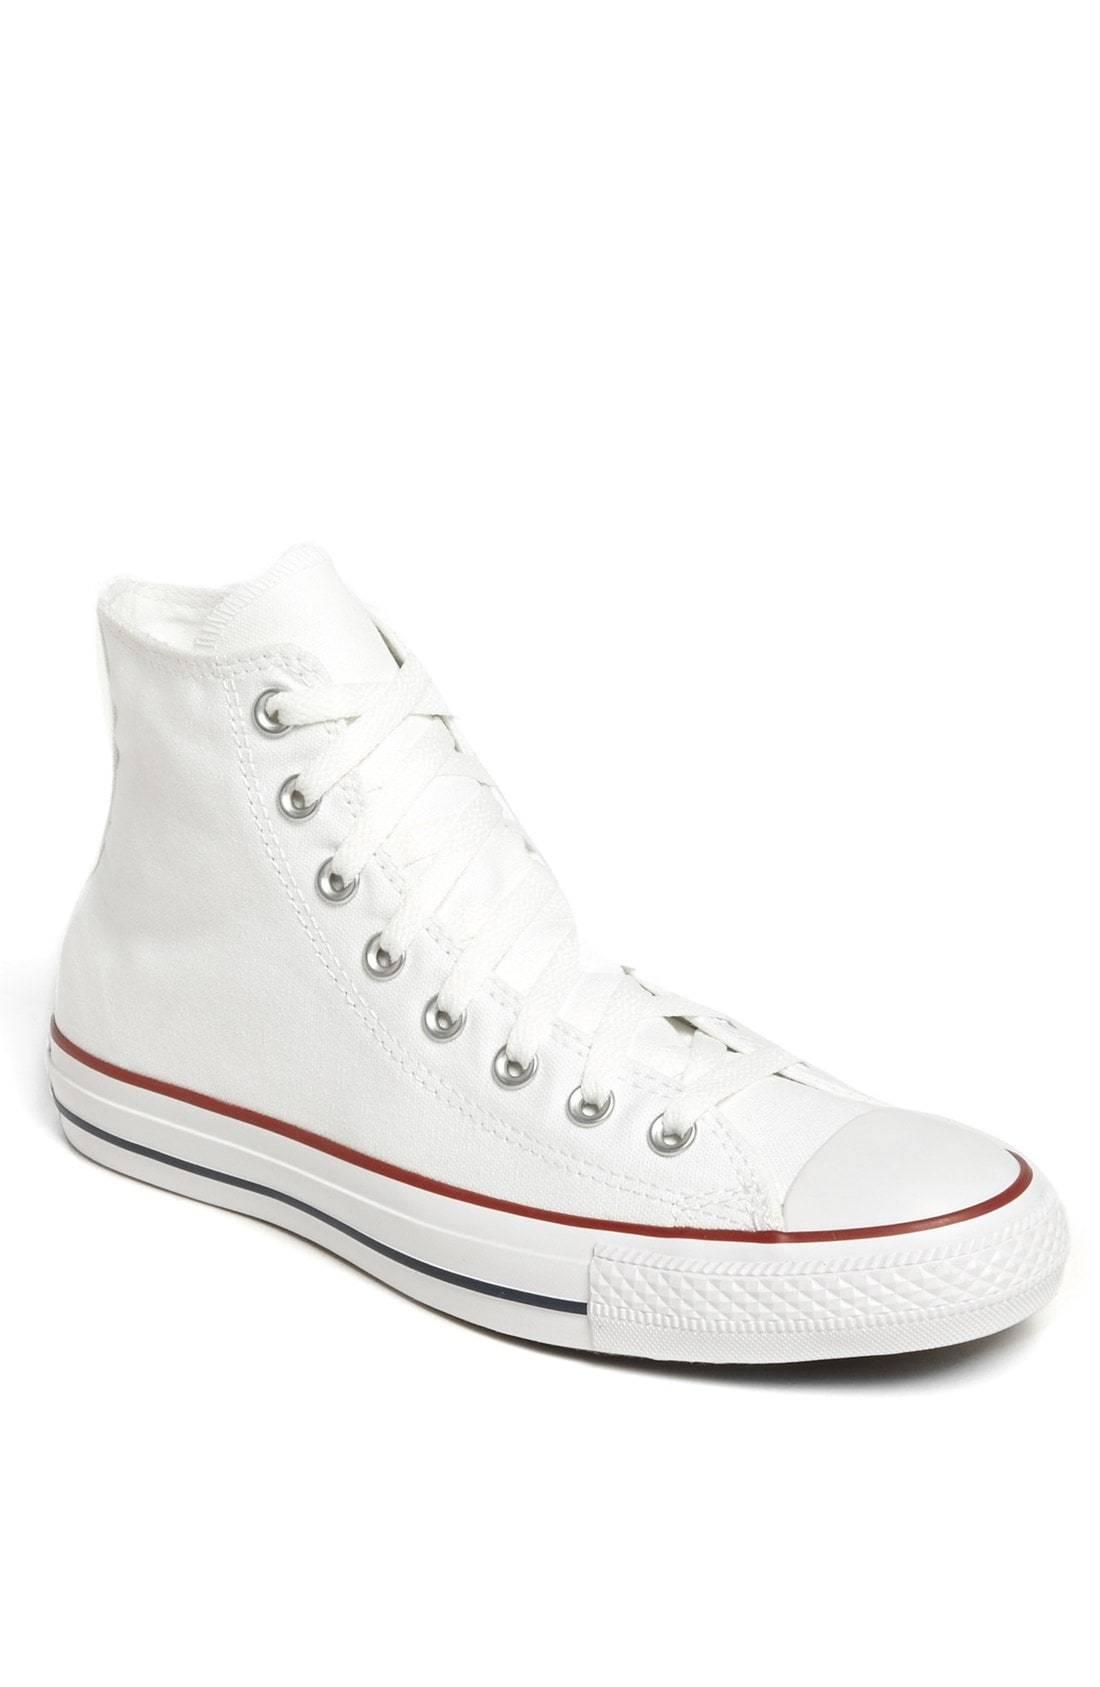 99471bbf3be5b2 ... Nordstrom x Converse Converse Chuck Taylor High Top Sneaker